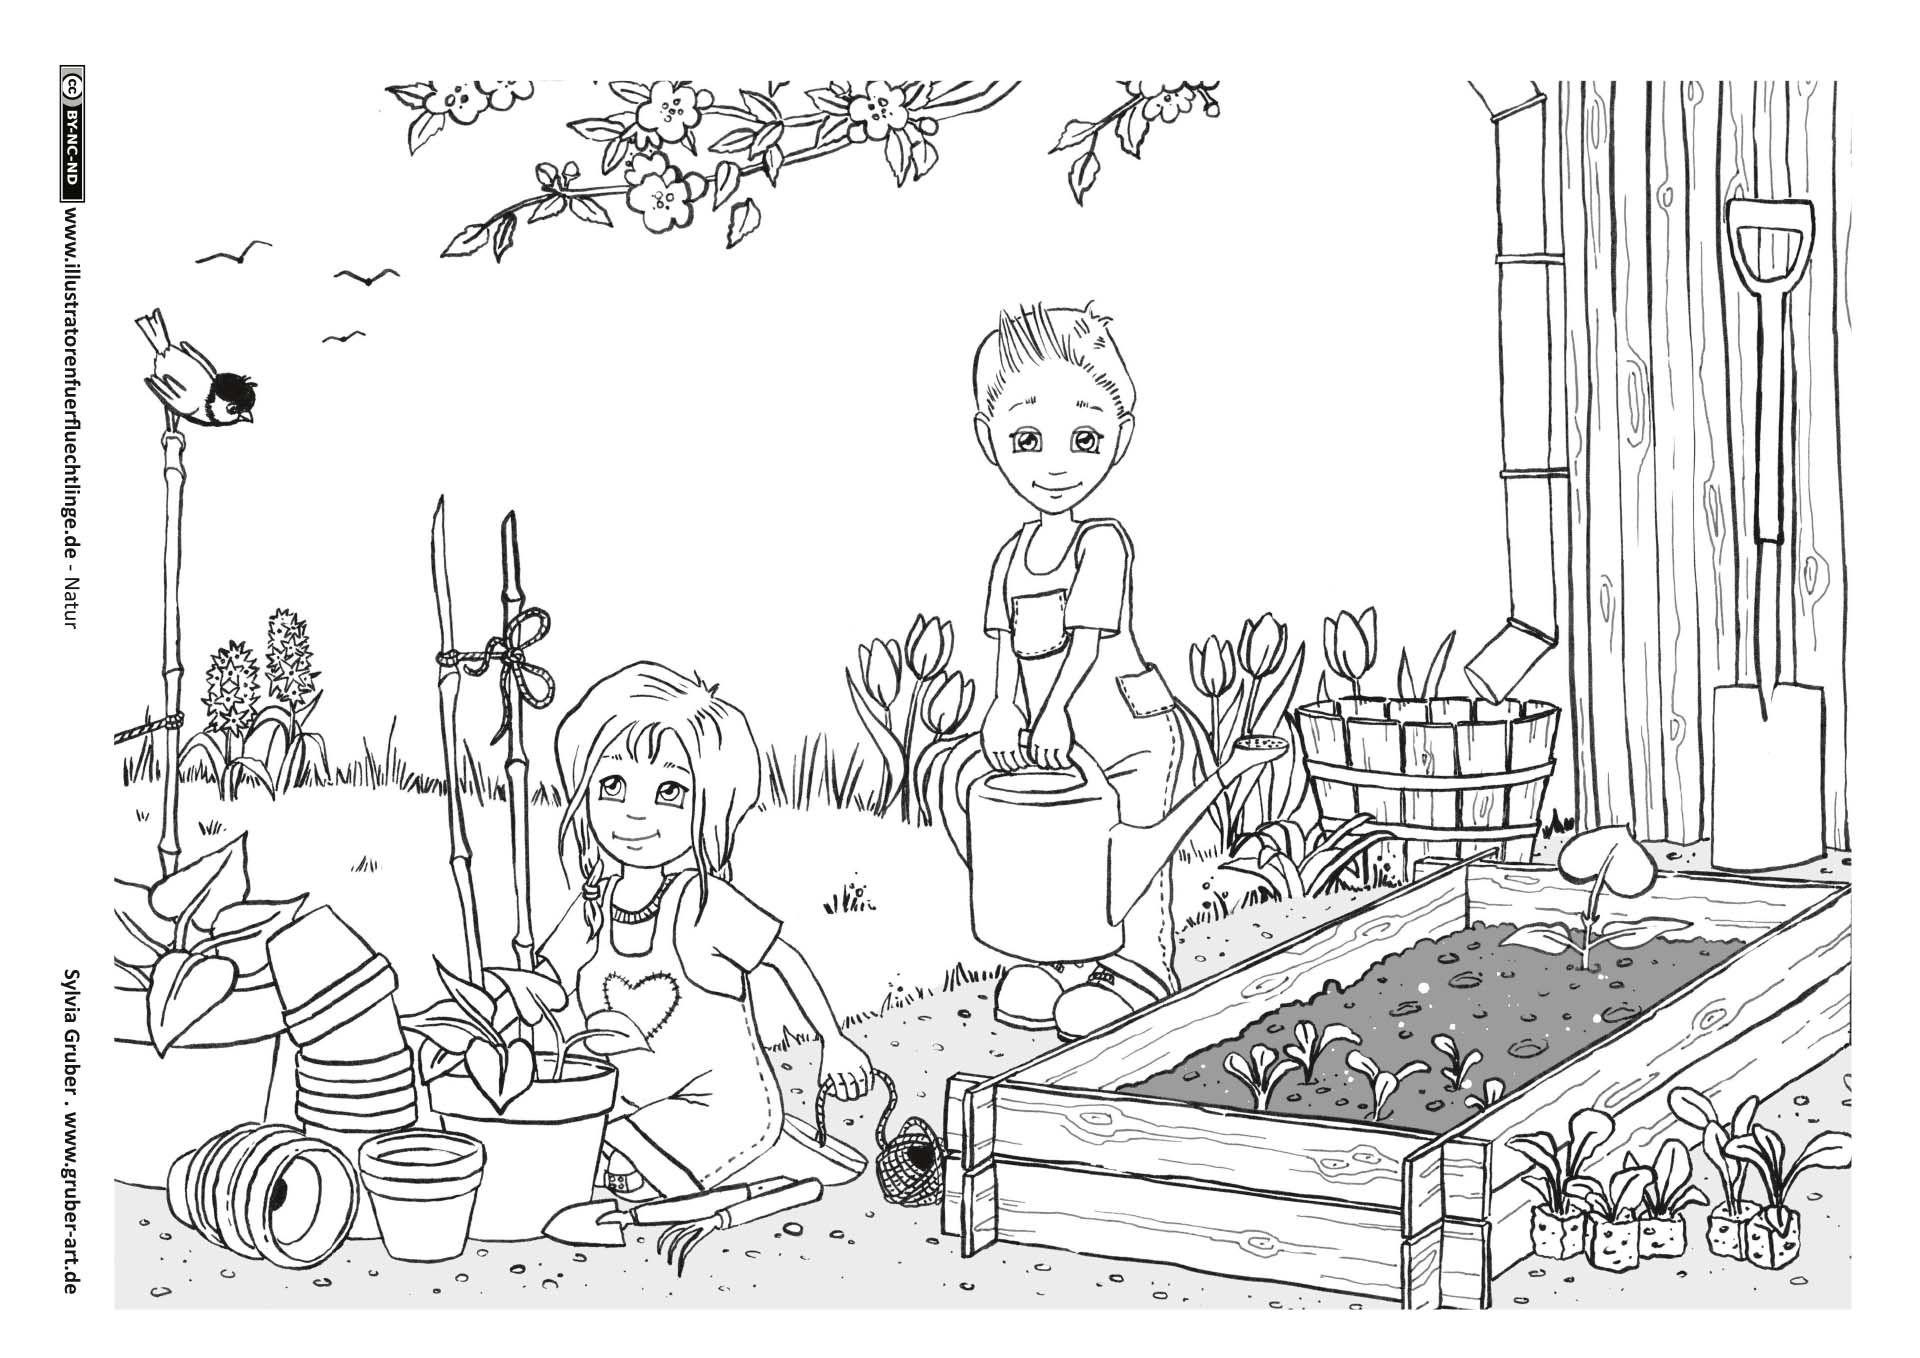 Garten Fruhling Kunstunterricht Kunstunterricht Grundschule Ausmalen